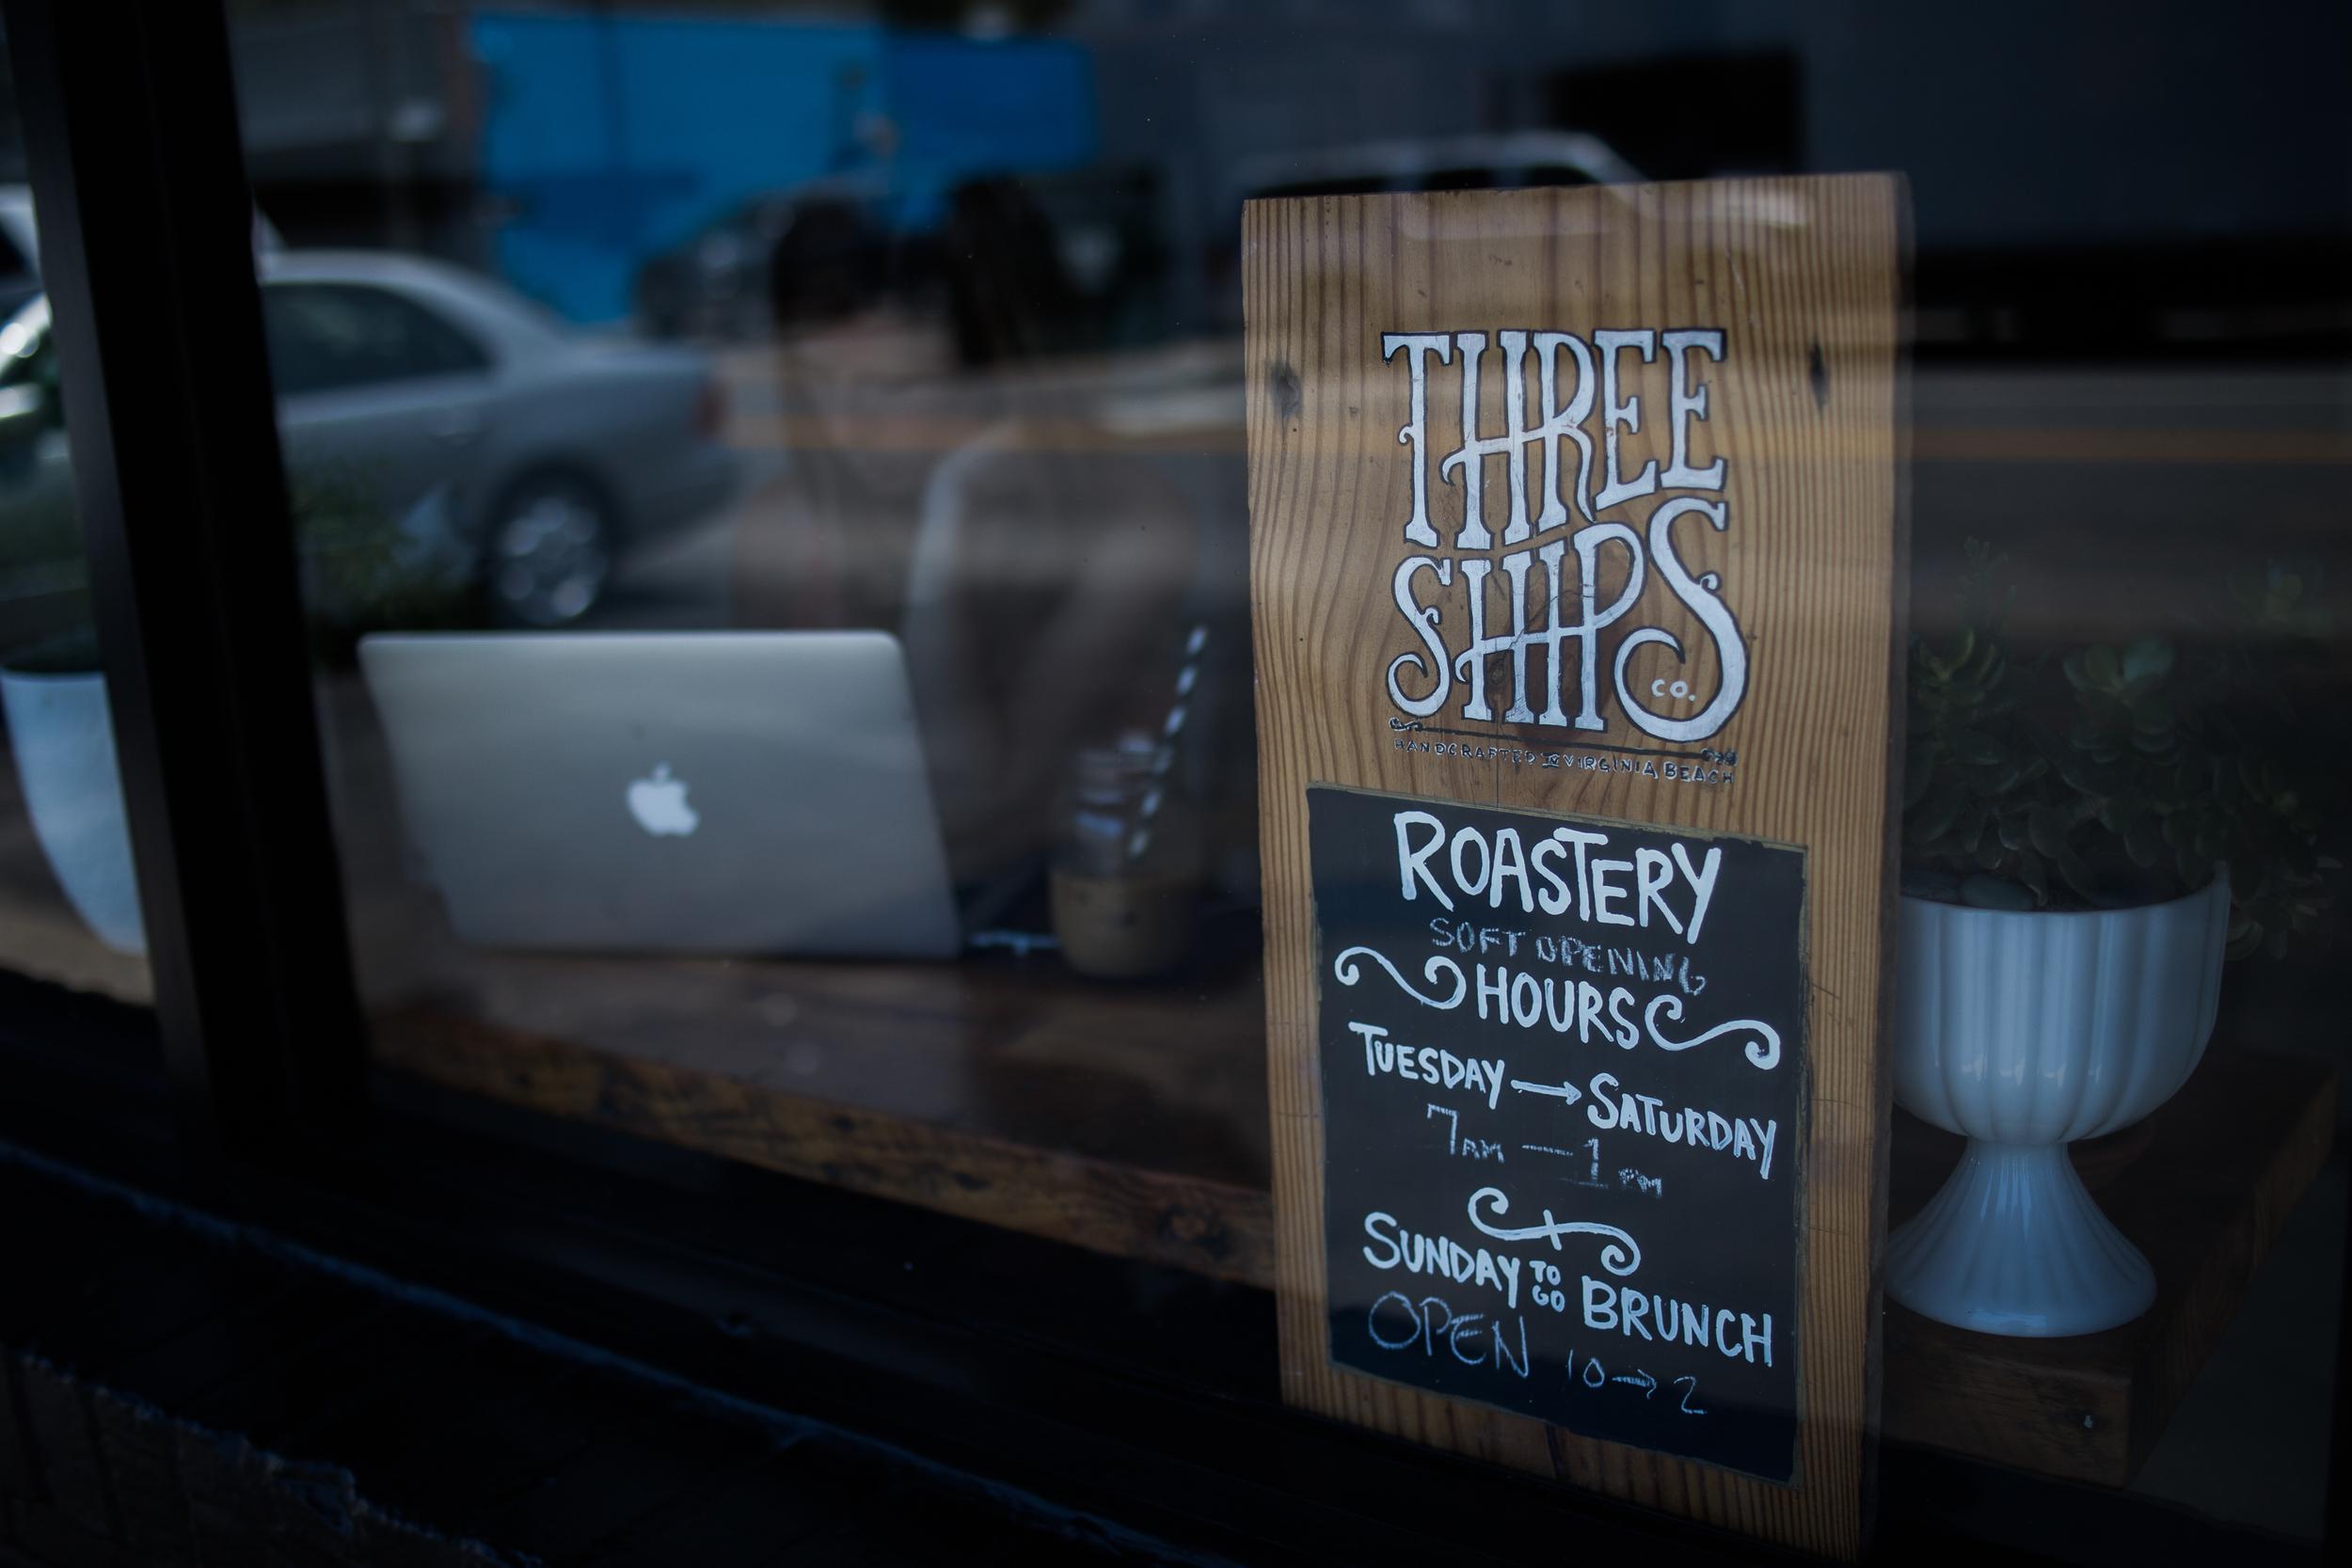 three-ships-coffee-87.jpg